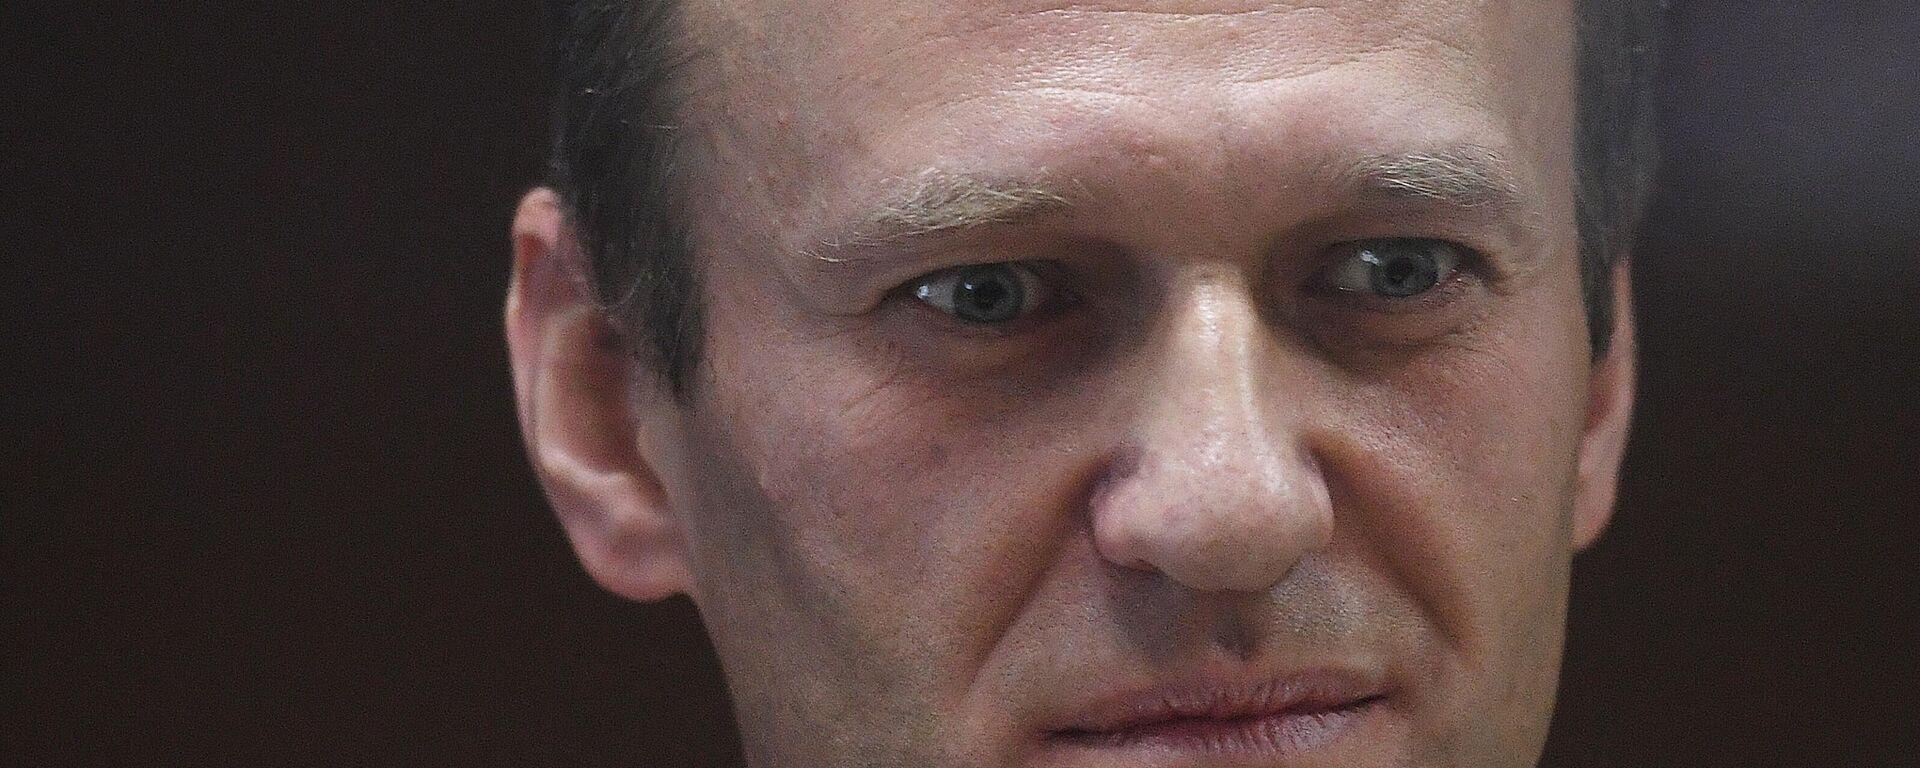 Alexéi Navalni, bloguero opositor ruso - Sputnik Mundo, 1920, 02.09.2021